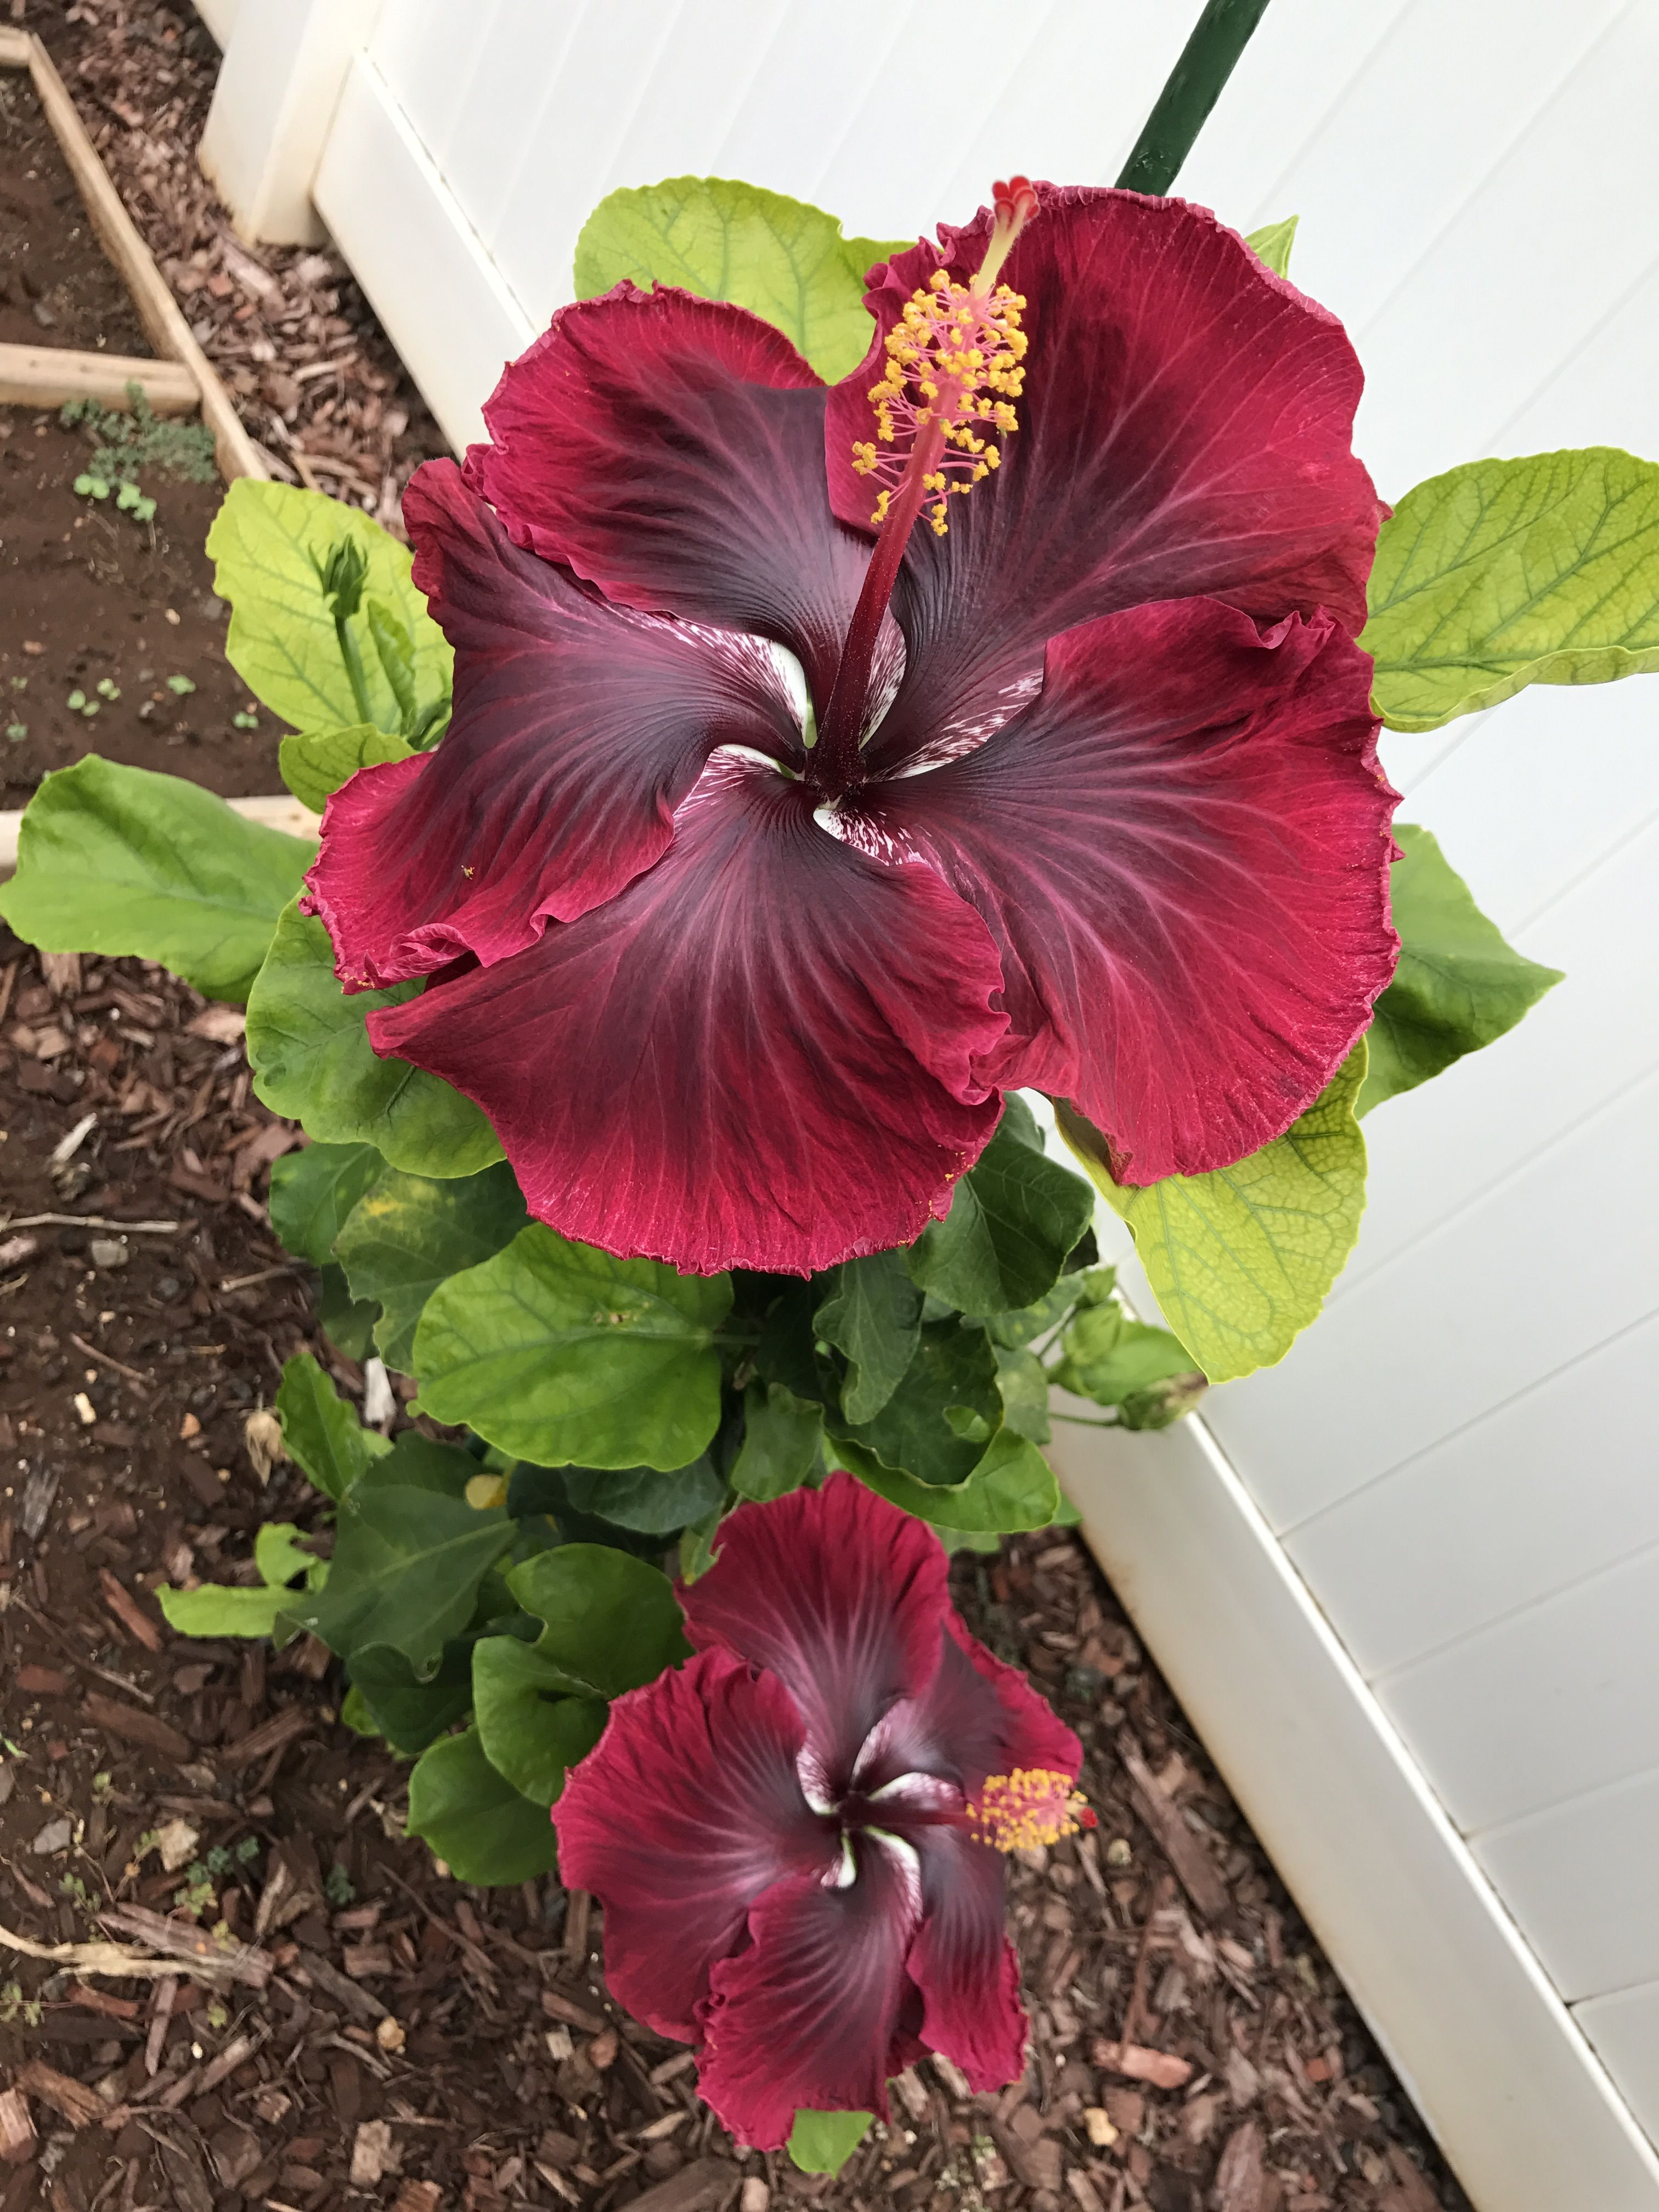 Black dragon hibiscus hibiscus of hawaii pinterest hibiscus black dragon hibiscus hibiscus bush hibiscus plant hibiscus flowers tropical plants exotic izmirmasajfo